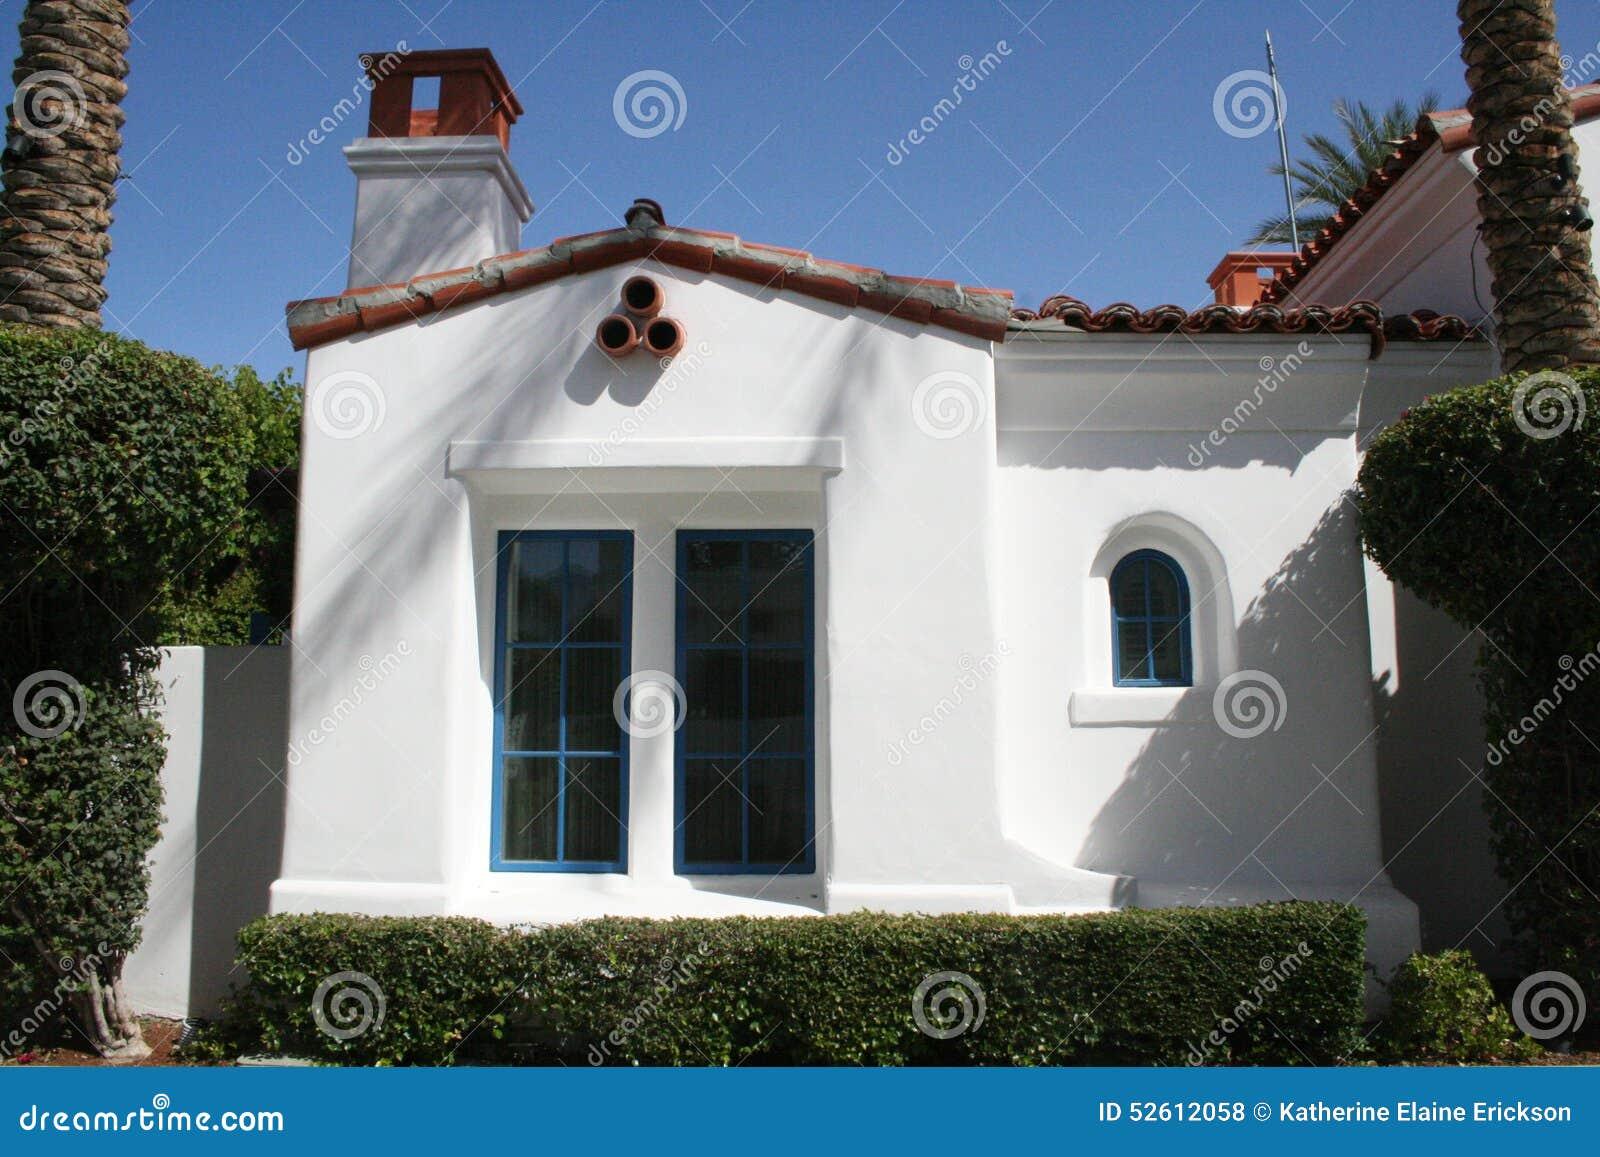 Download Desert Bungalow stock photo. Image of rental, rooftop - 52612058